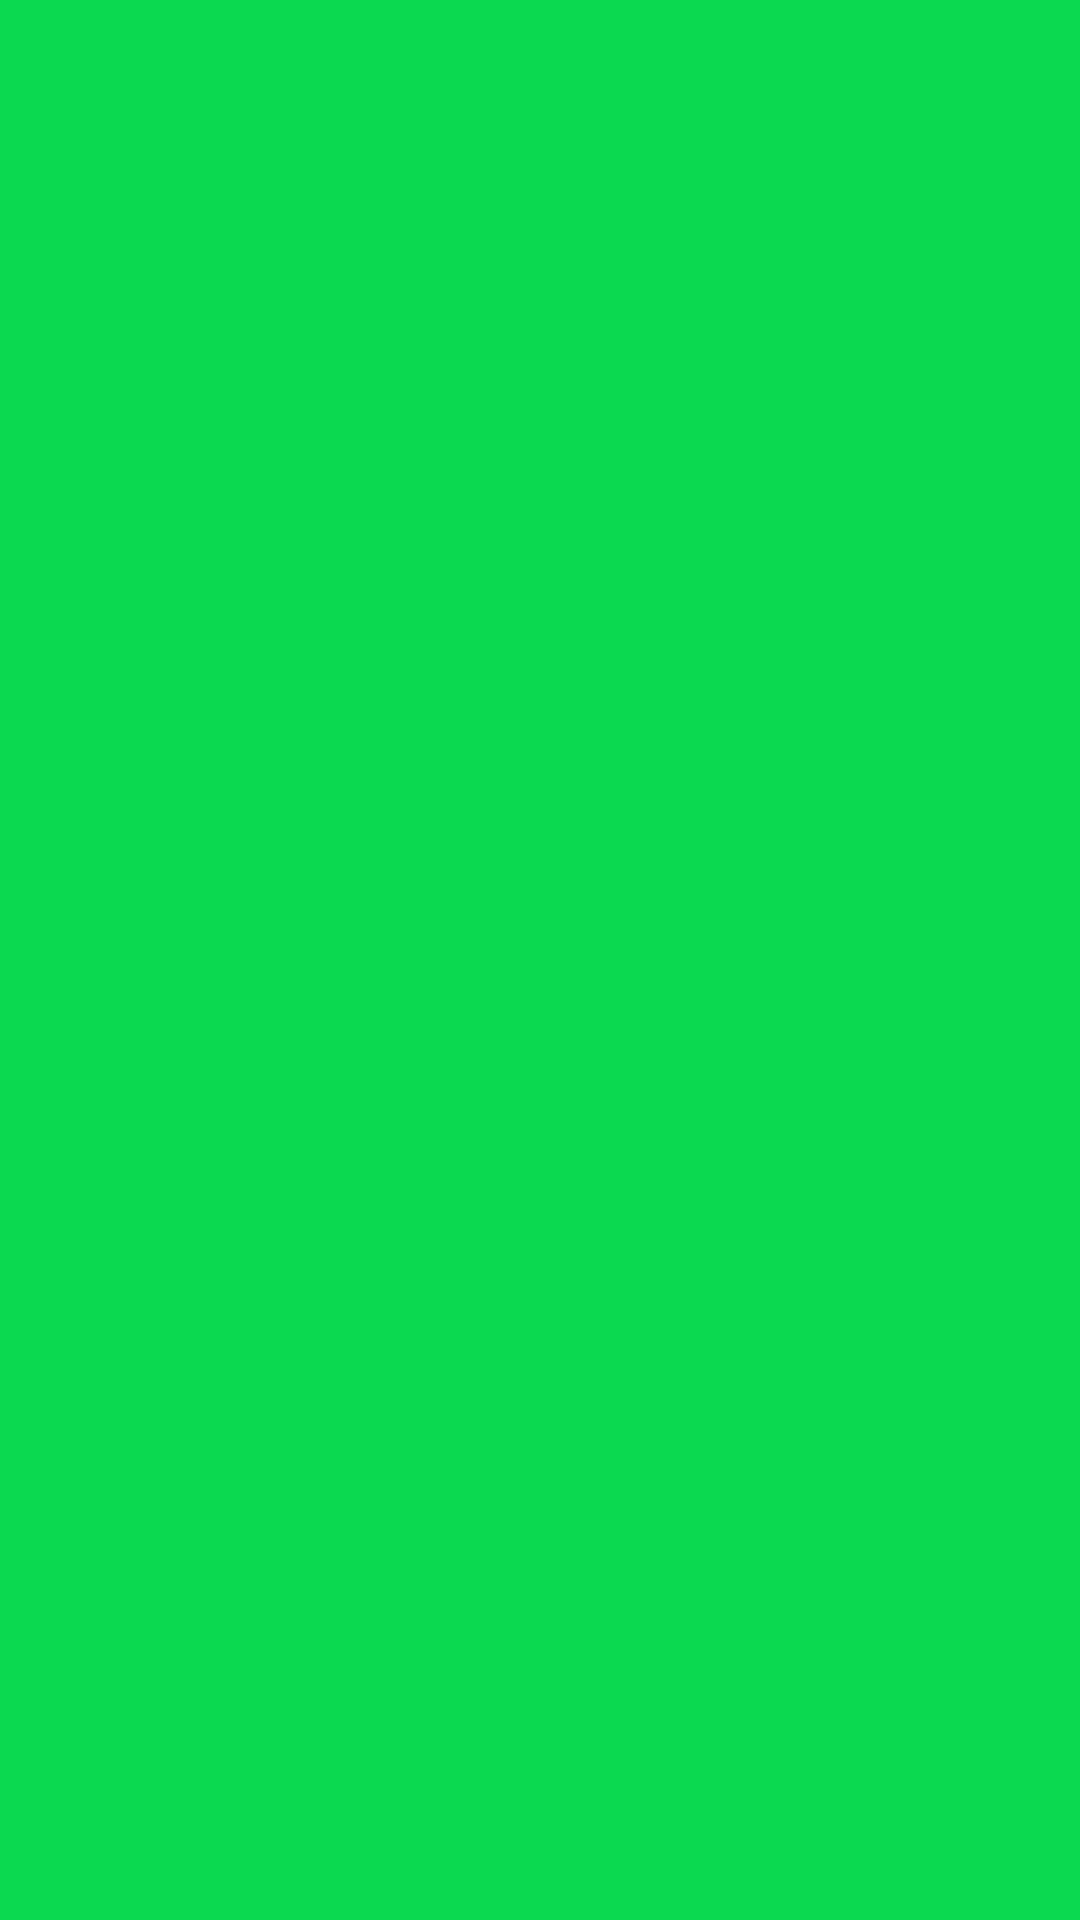 1080x1920 Malachite Solid Color Background